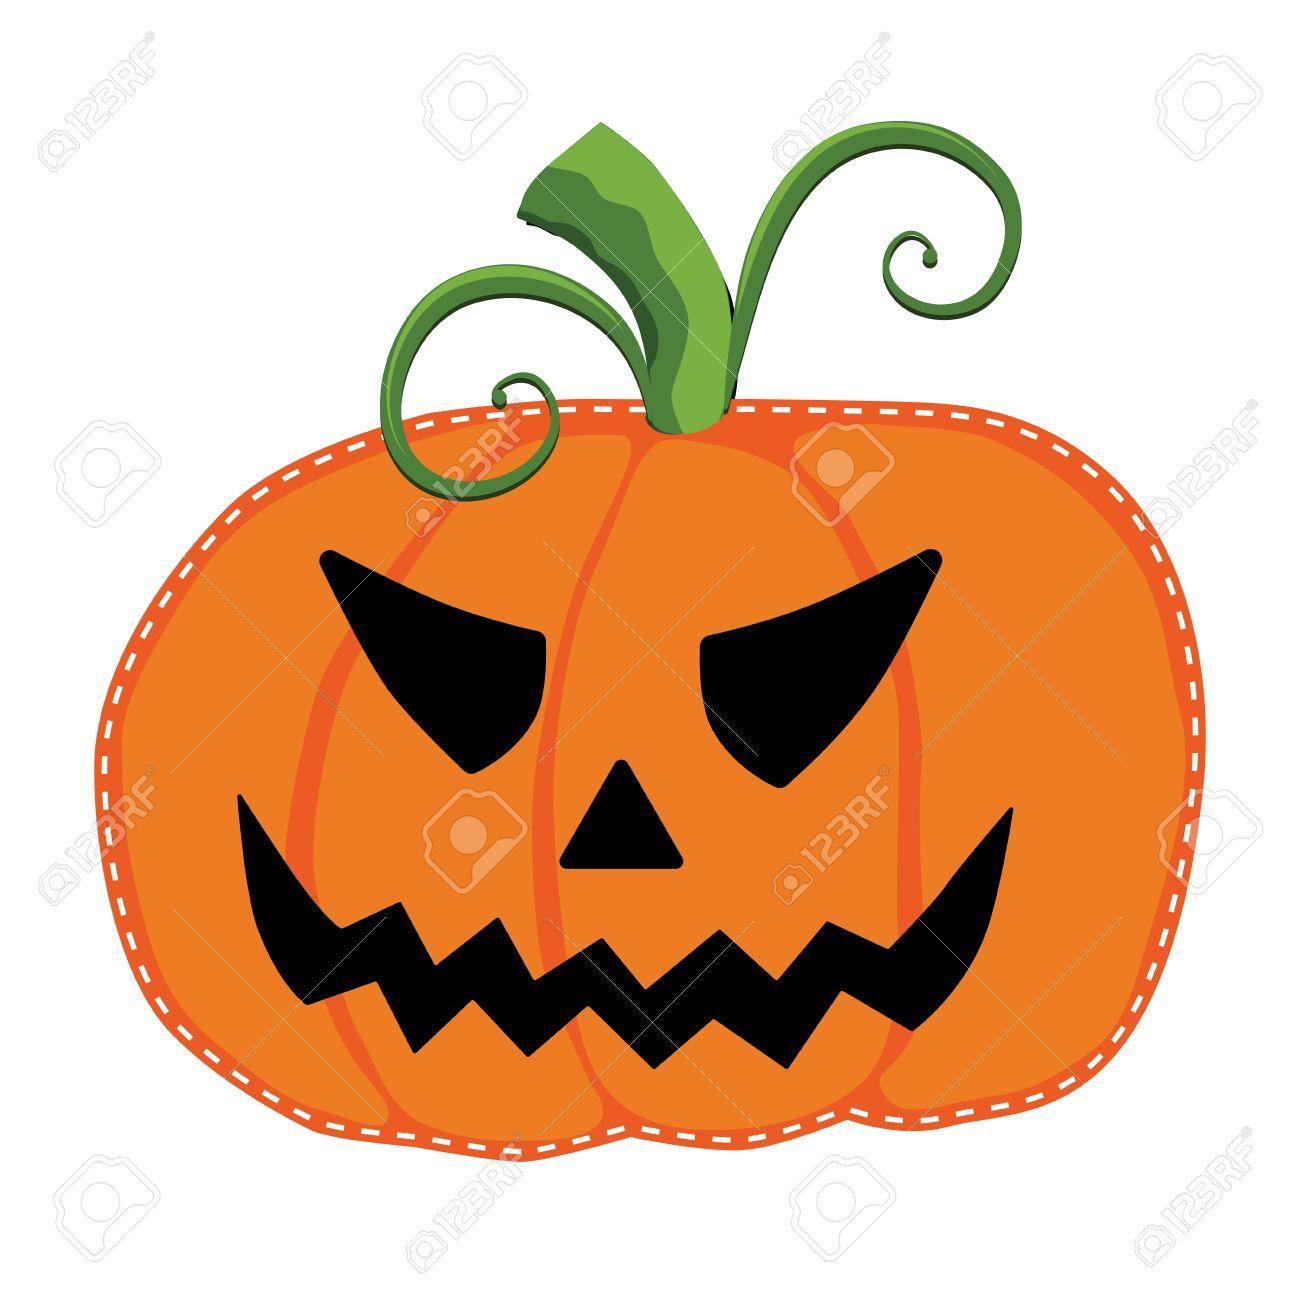 jack o lantern or carved pumpkin on a transparent background royalty rh 123rf com Pumpkins and Fall Leaves Clip Art Bright Pumpkin Clip Art